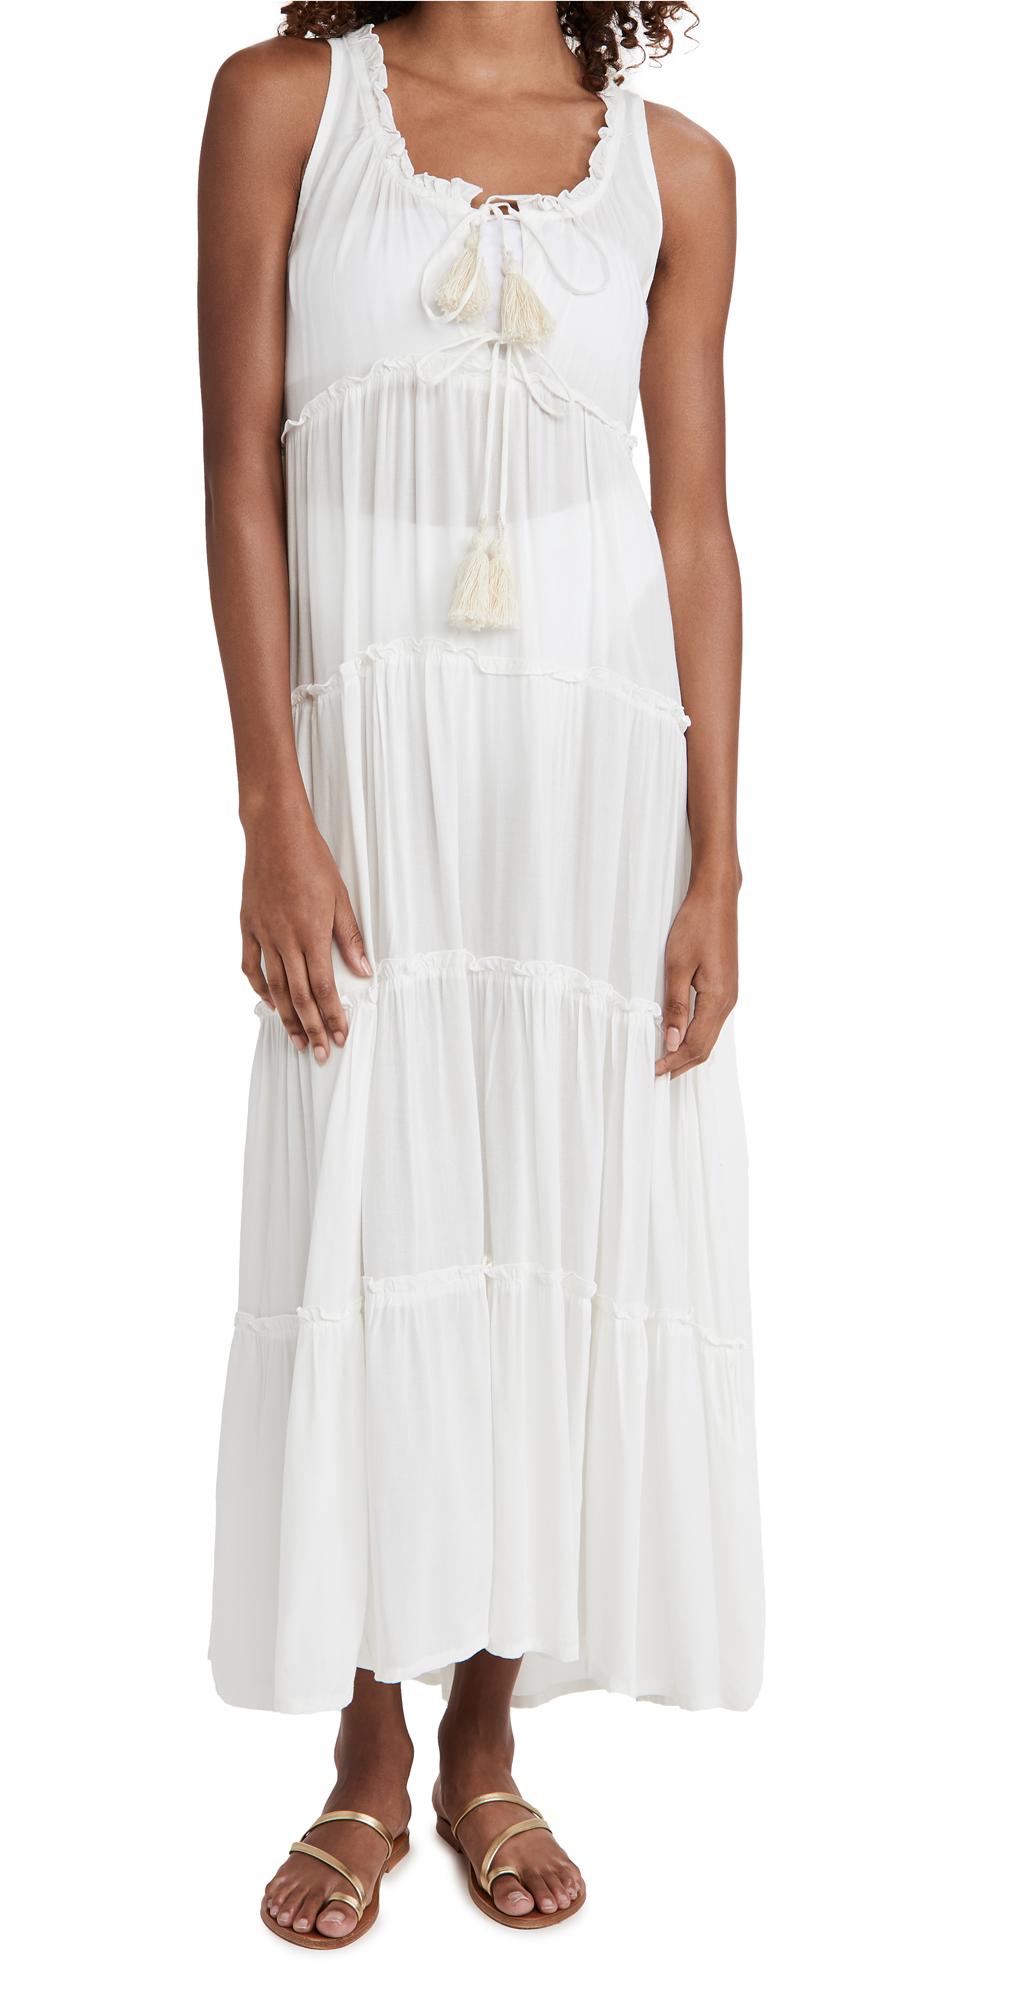 Everley Dress